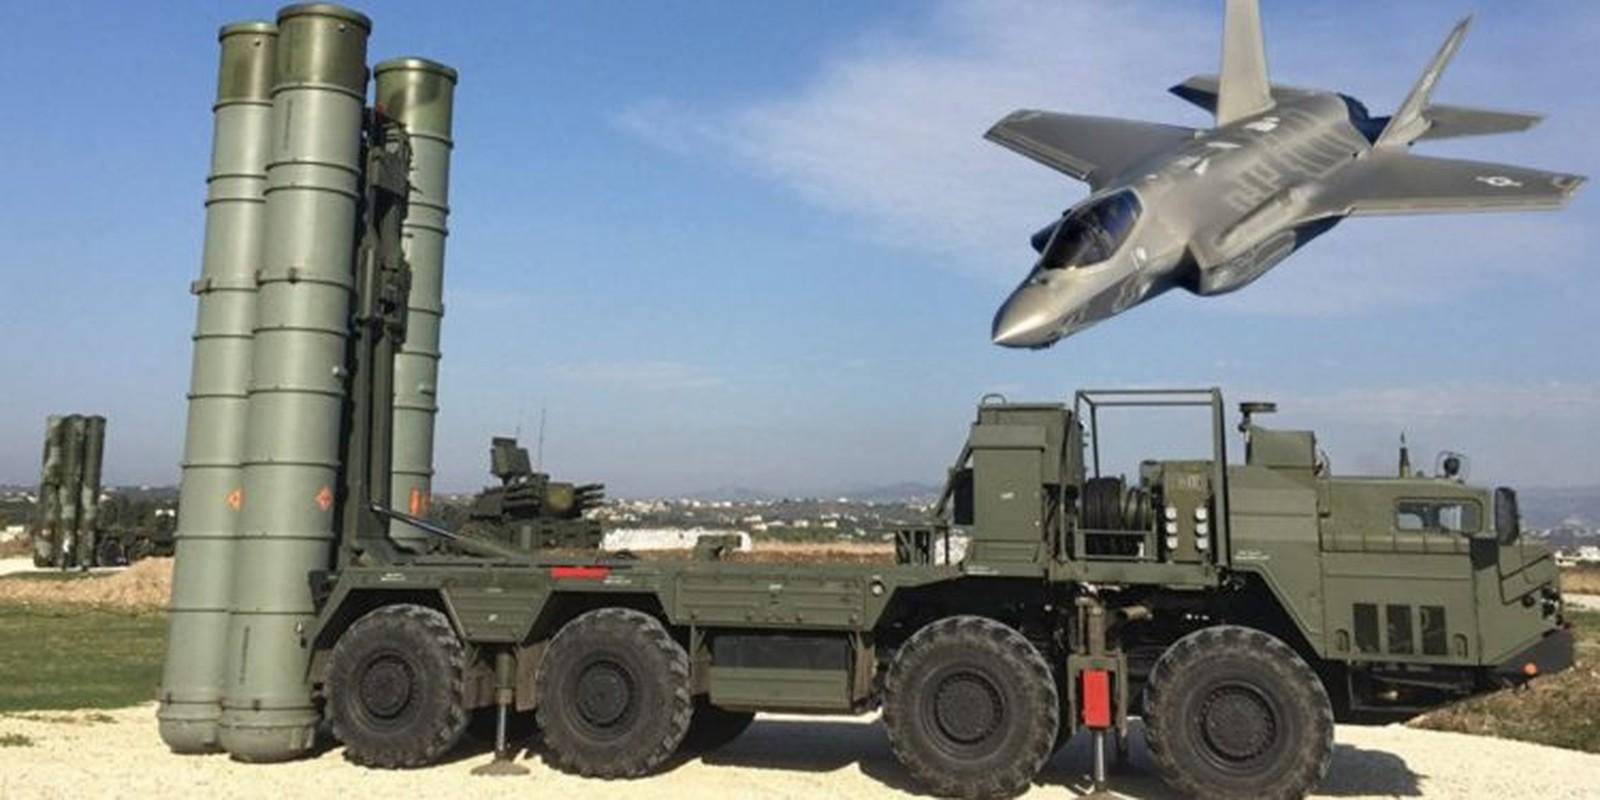 Nhung loai vu khi cua Nga khien Belarus khao khat so huu-Hinh-11